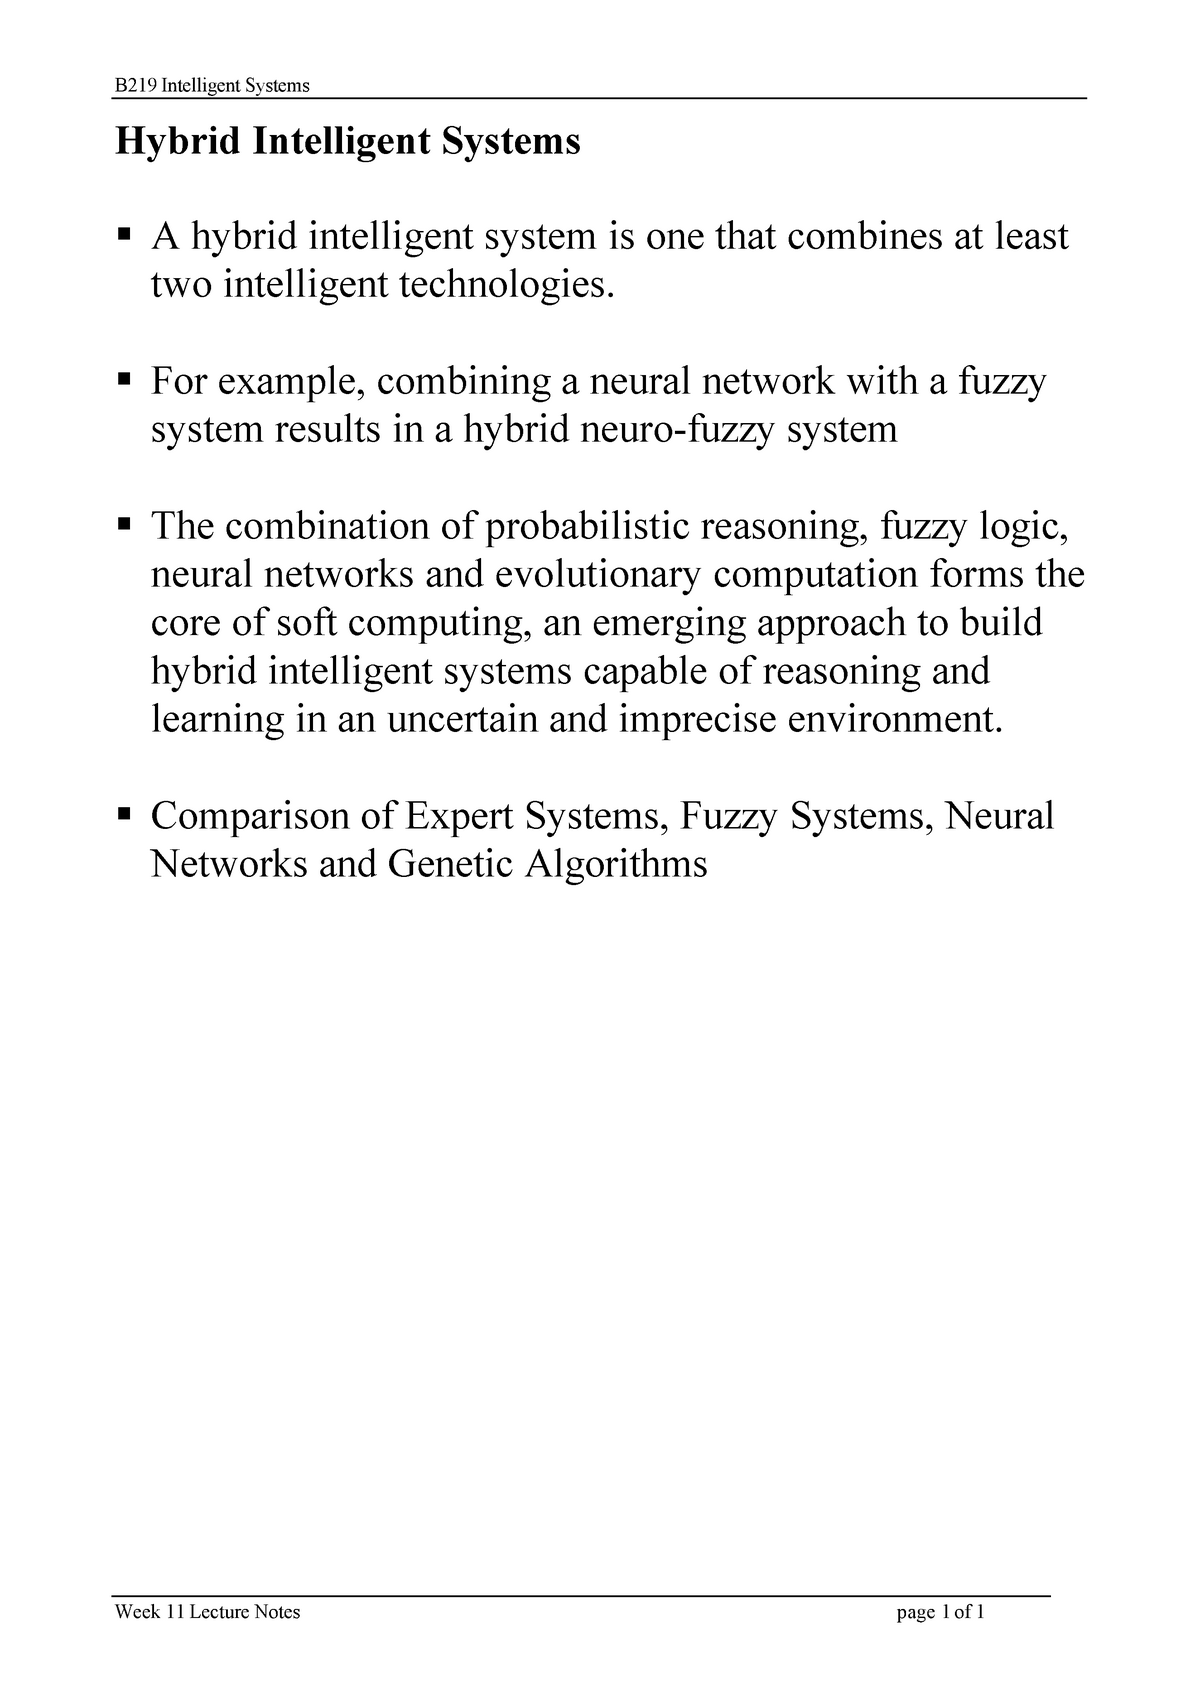 ICT219 Lecture 11 - Hybrid Intelligent Systems - ICT219: Intelligent